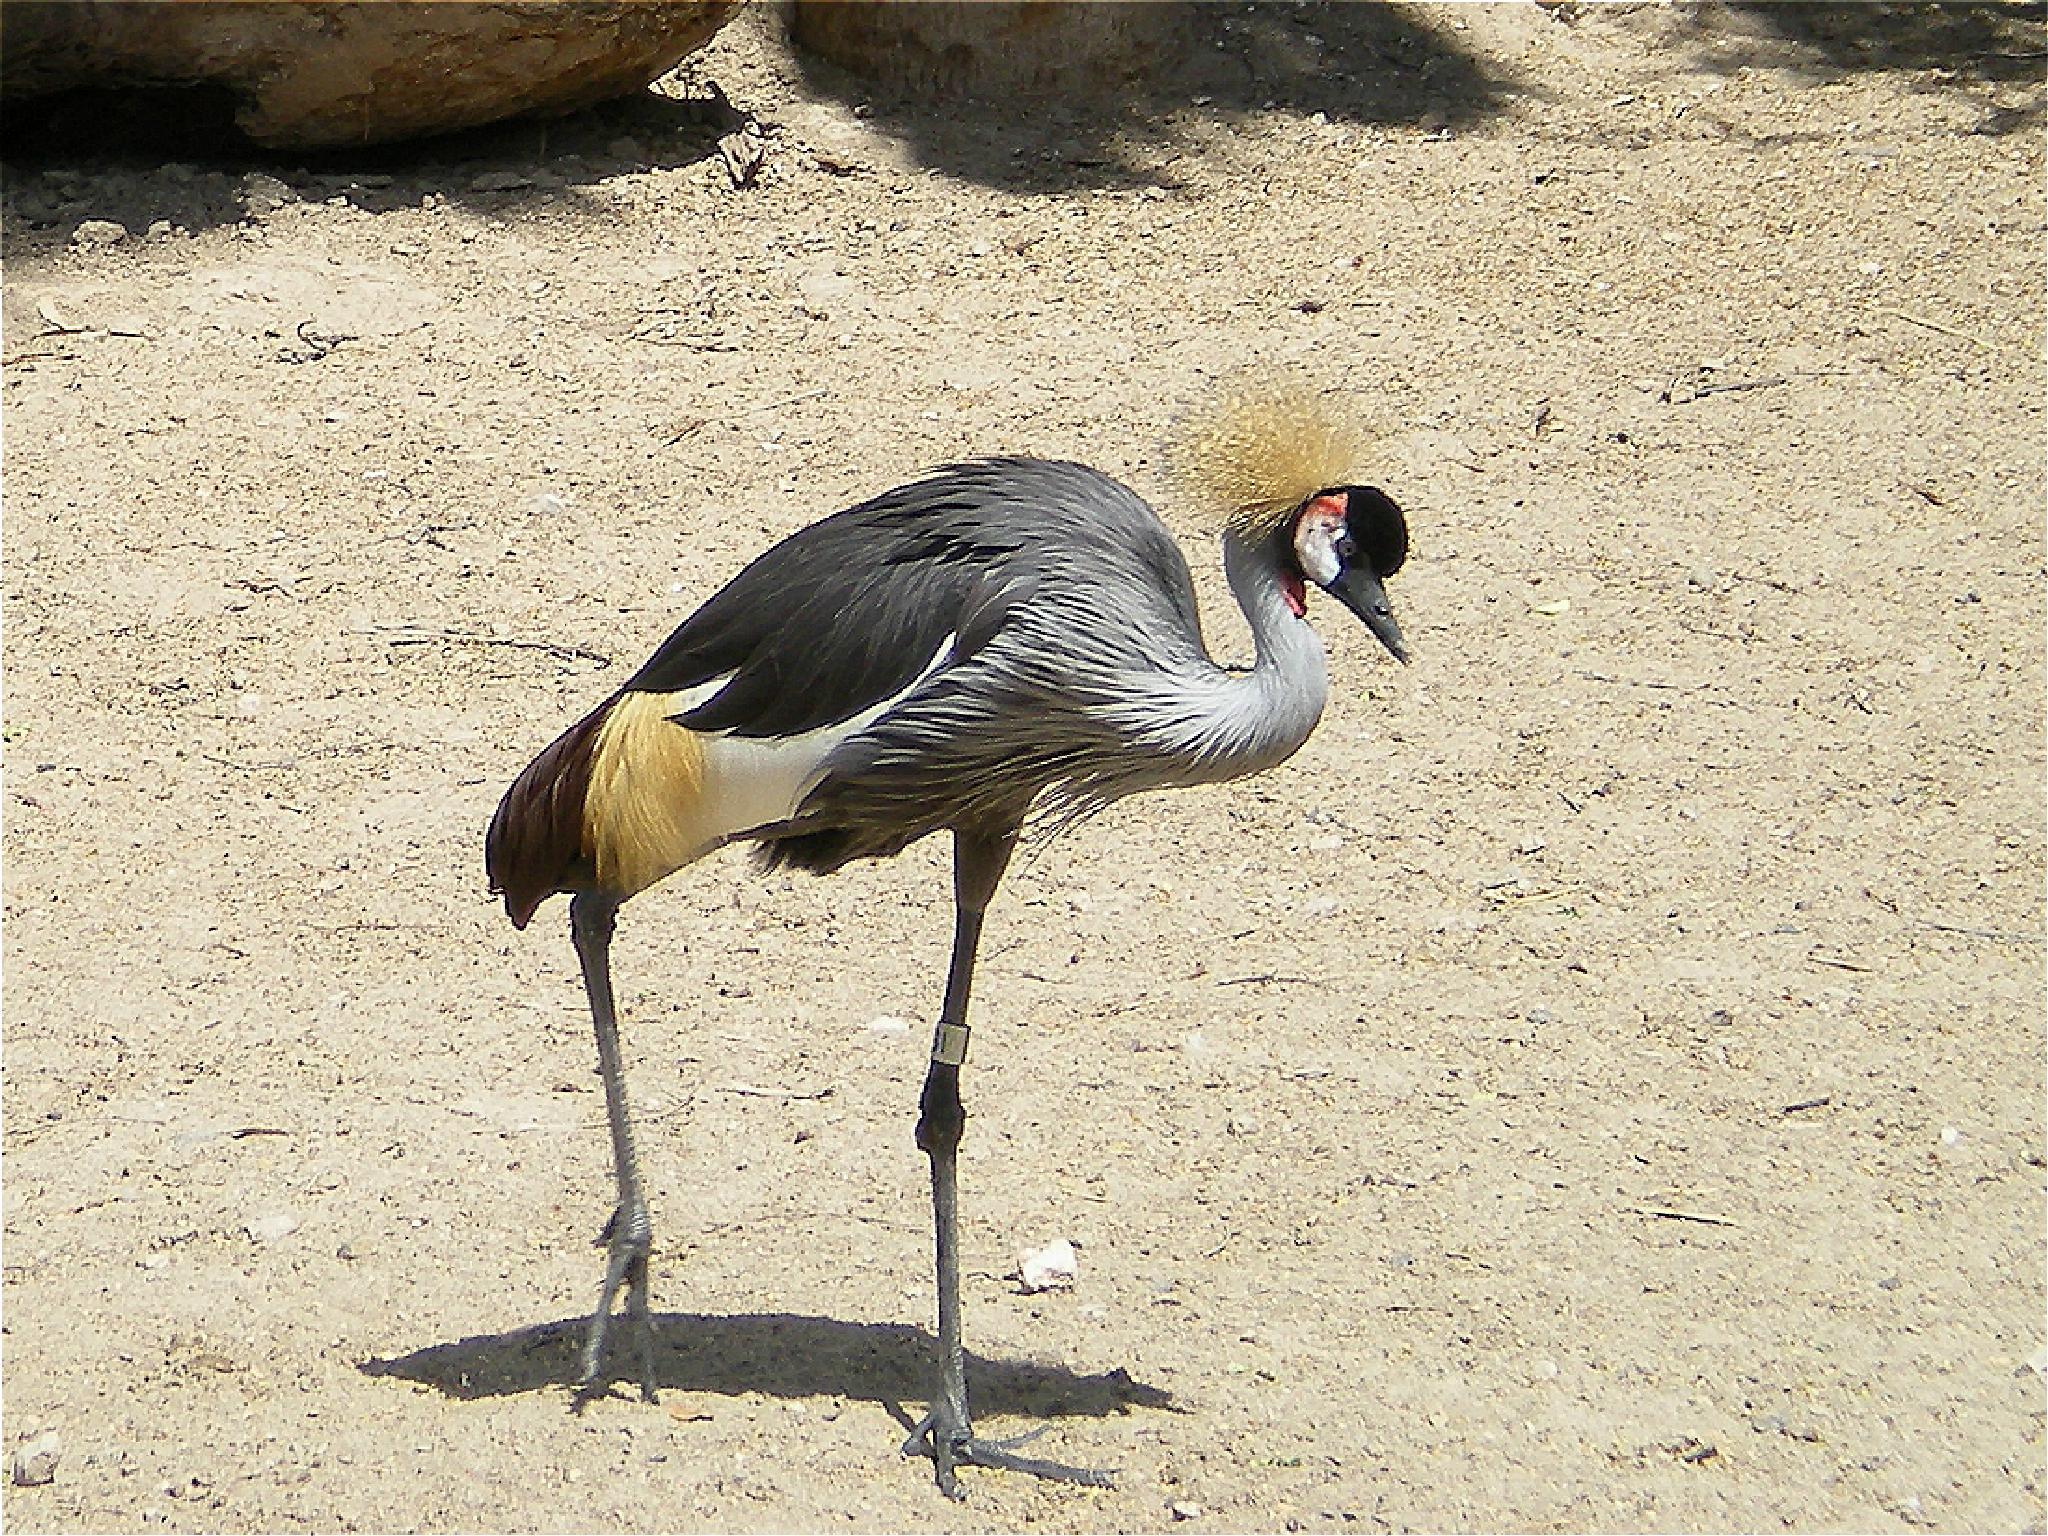 PRETTY BIRD by bechcomber444